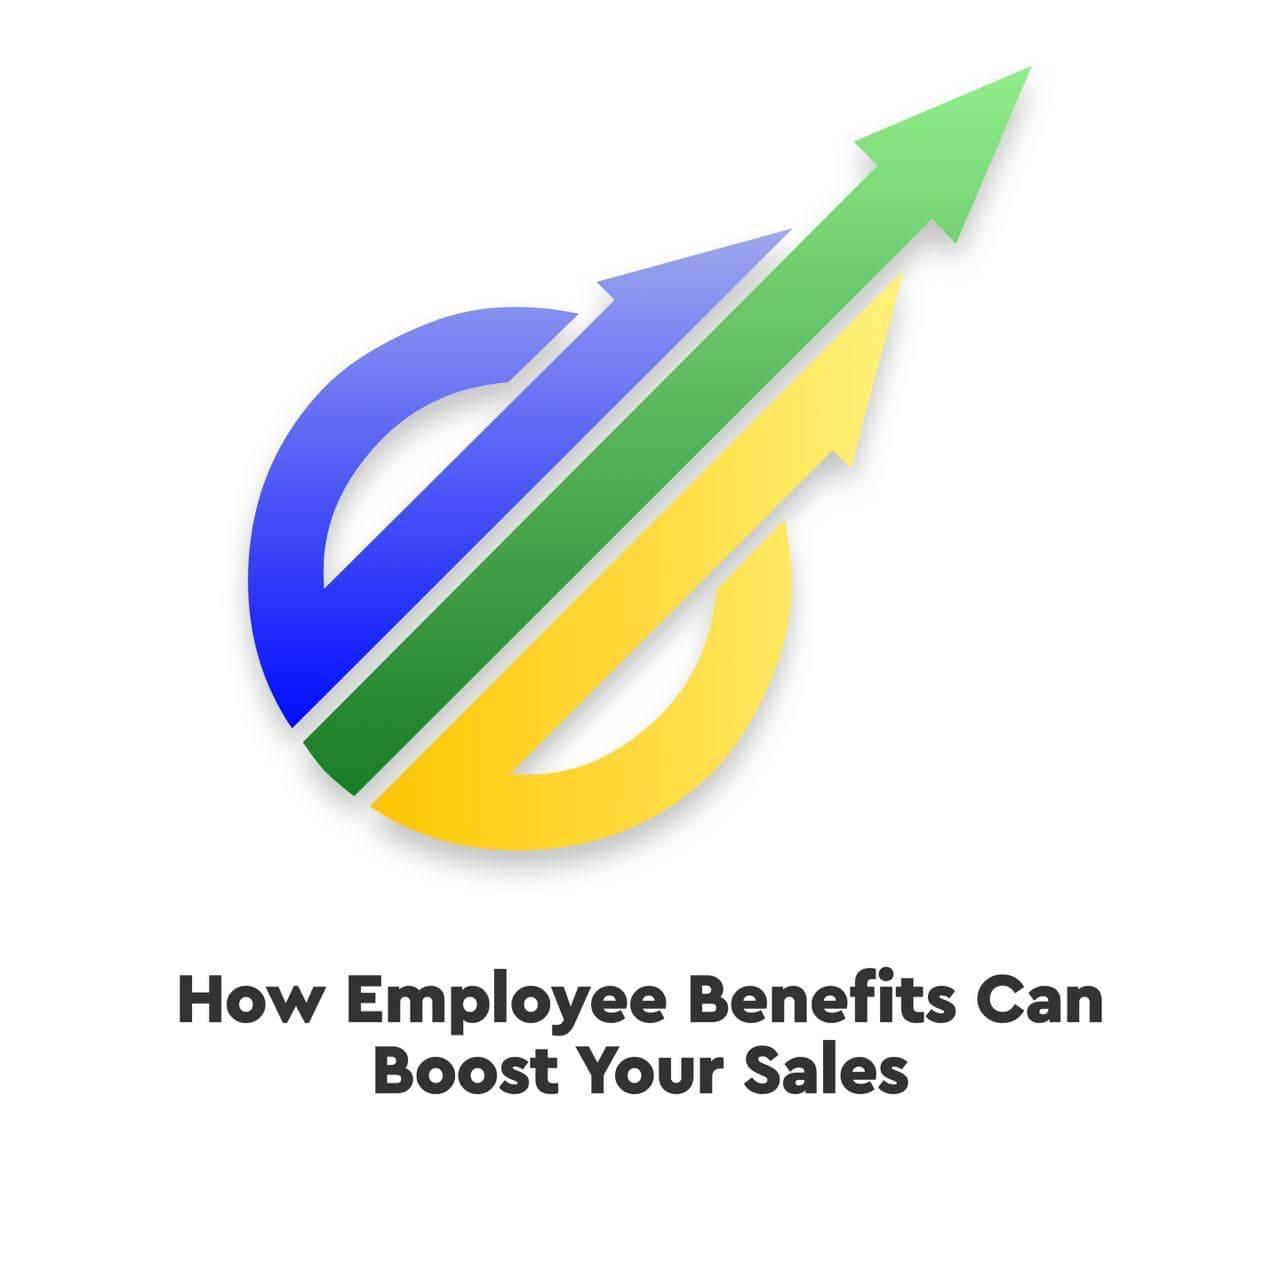 Advantages of Having Employee Benefits